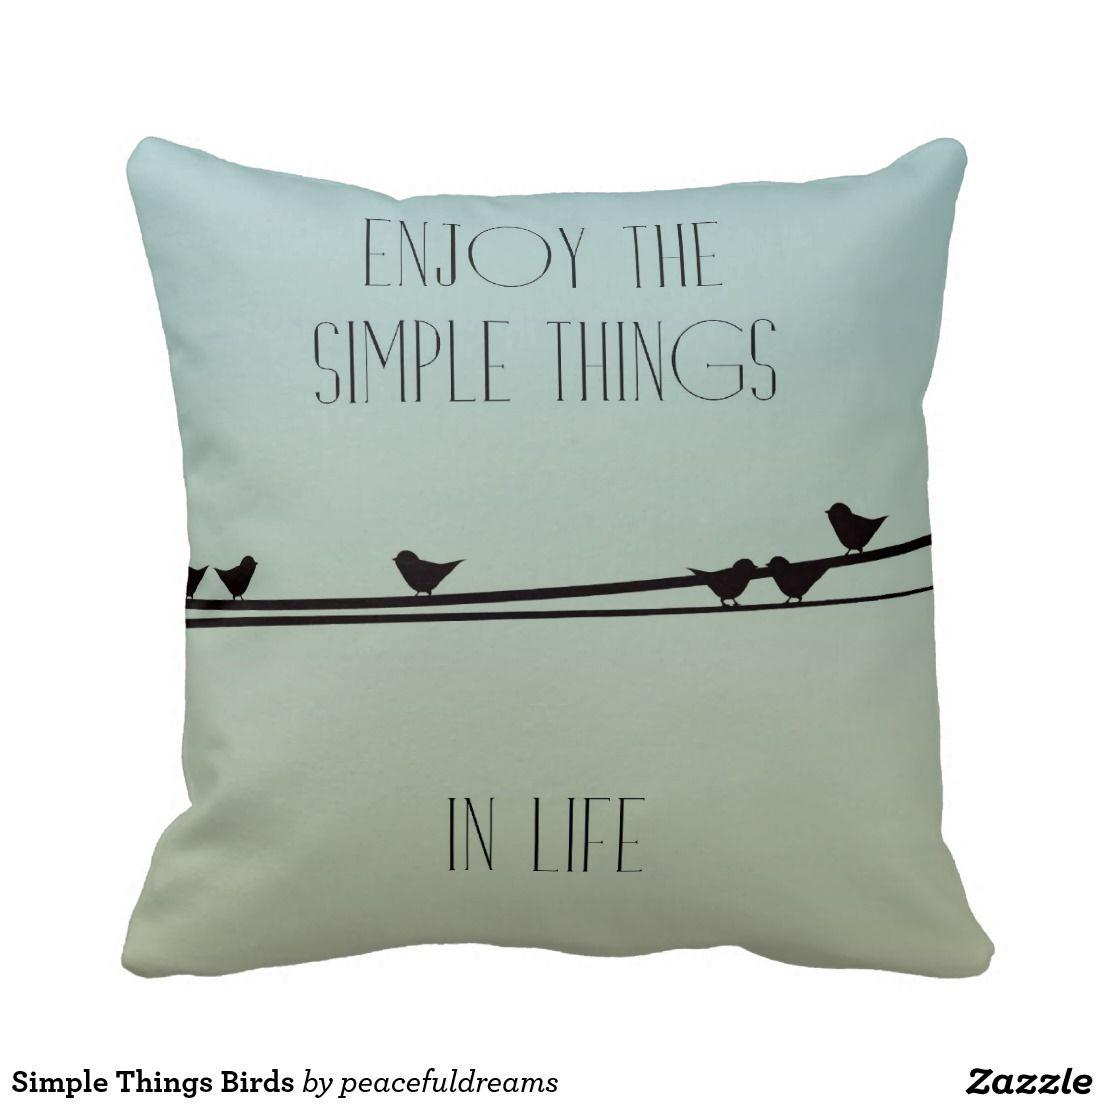 Simple Things Birds Throw Pillow Zazzle Com Bird Throw Pillow Bird Pillow Pillows